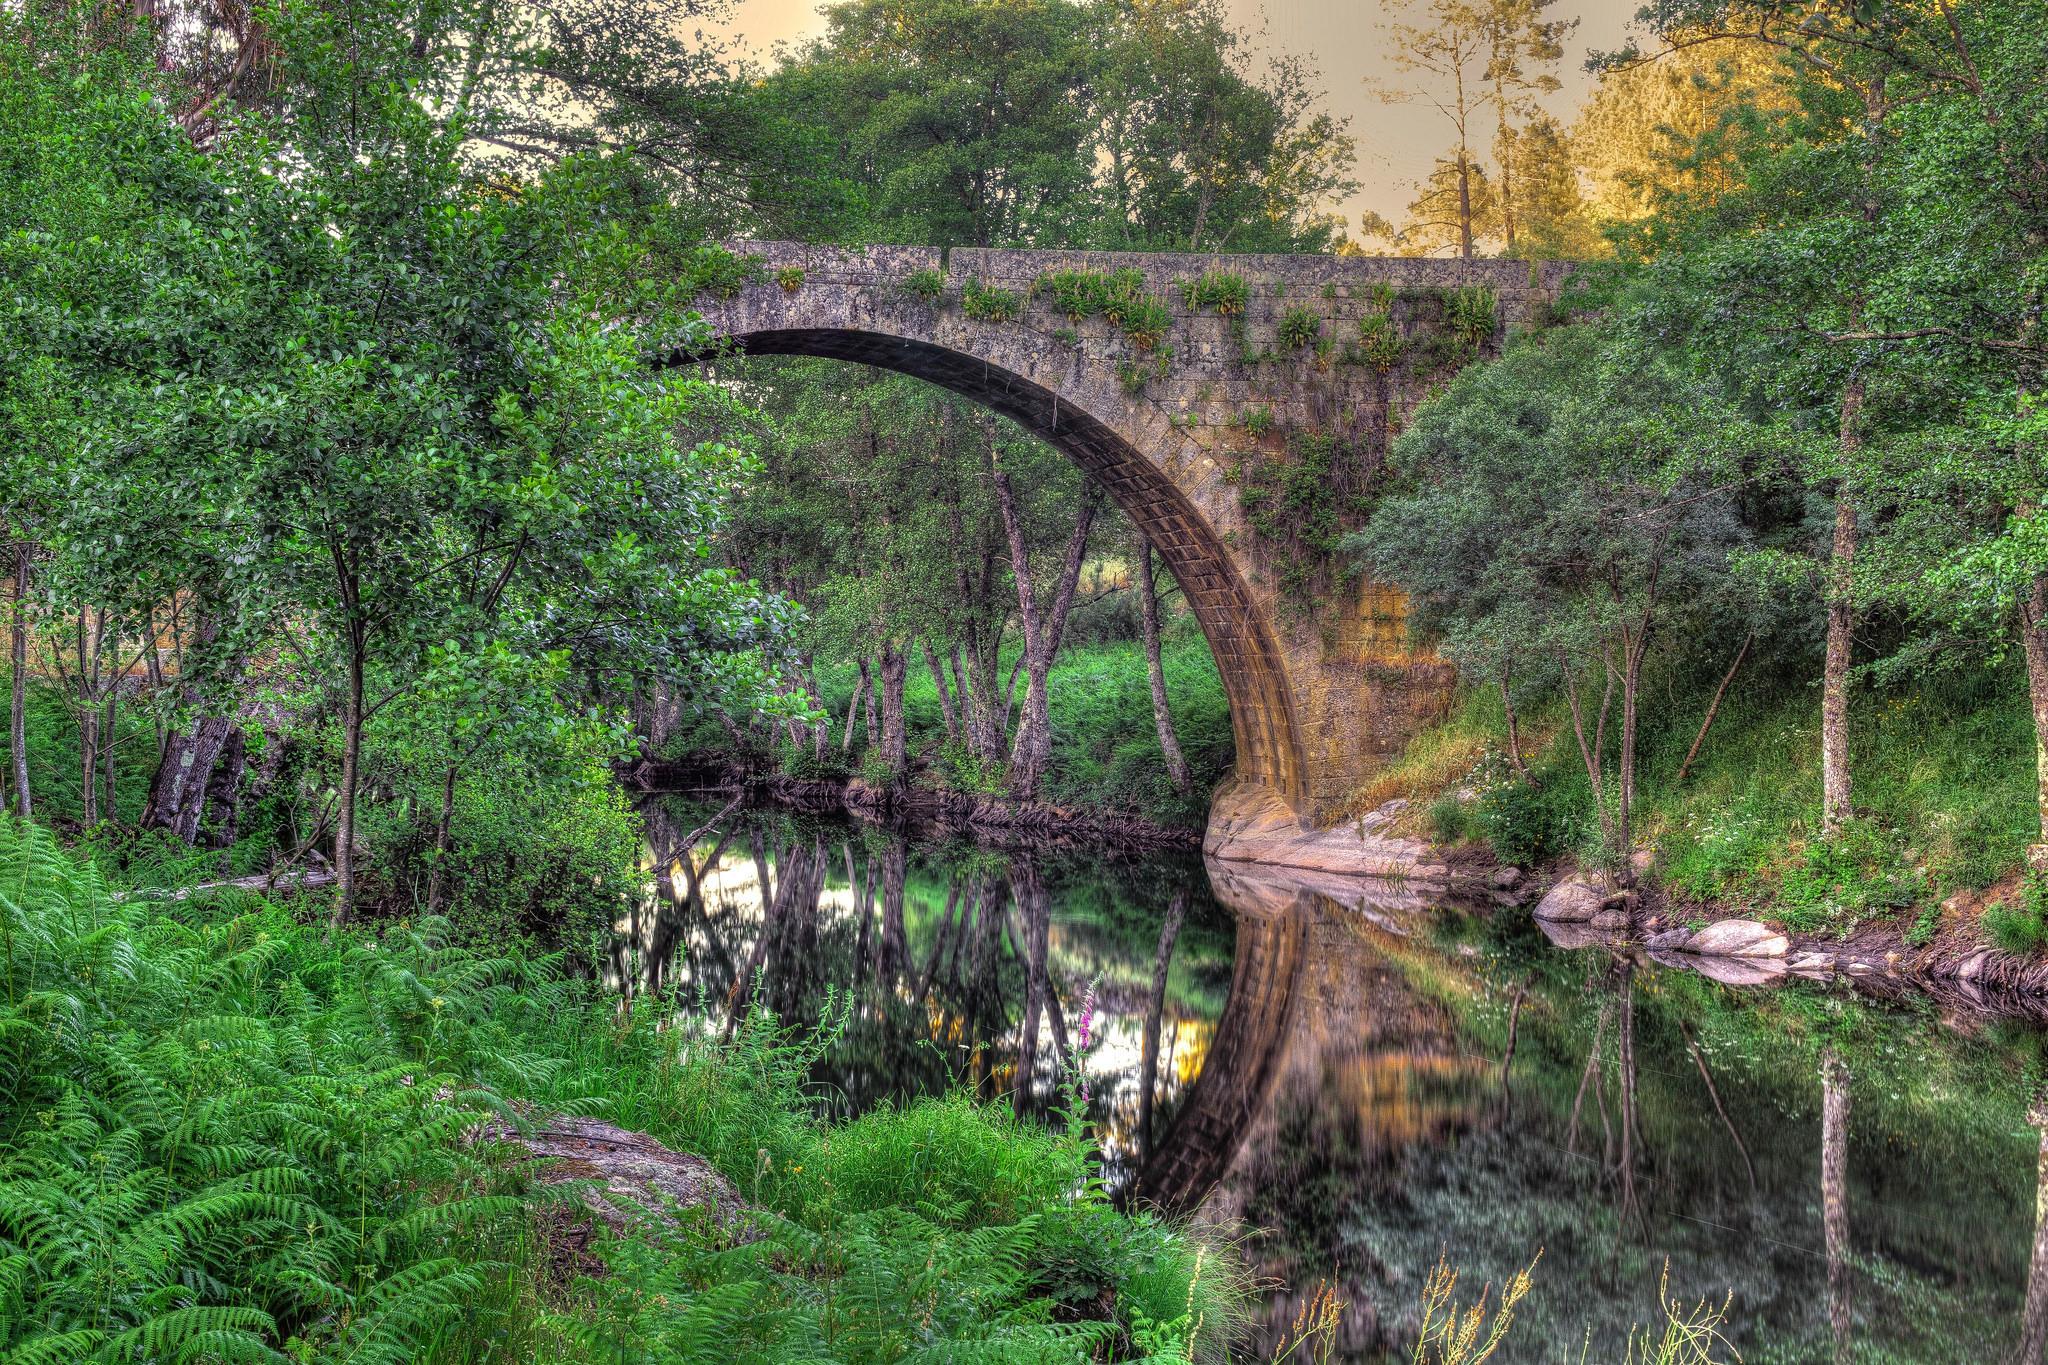 обои Римская мостовая арка, Пеналва-ду-Каштелу, Визеу, Португалия картинки фото